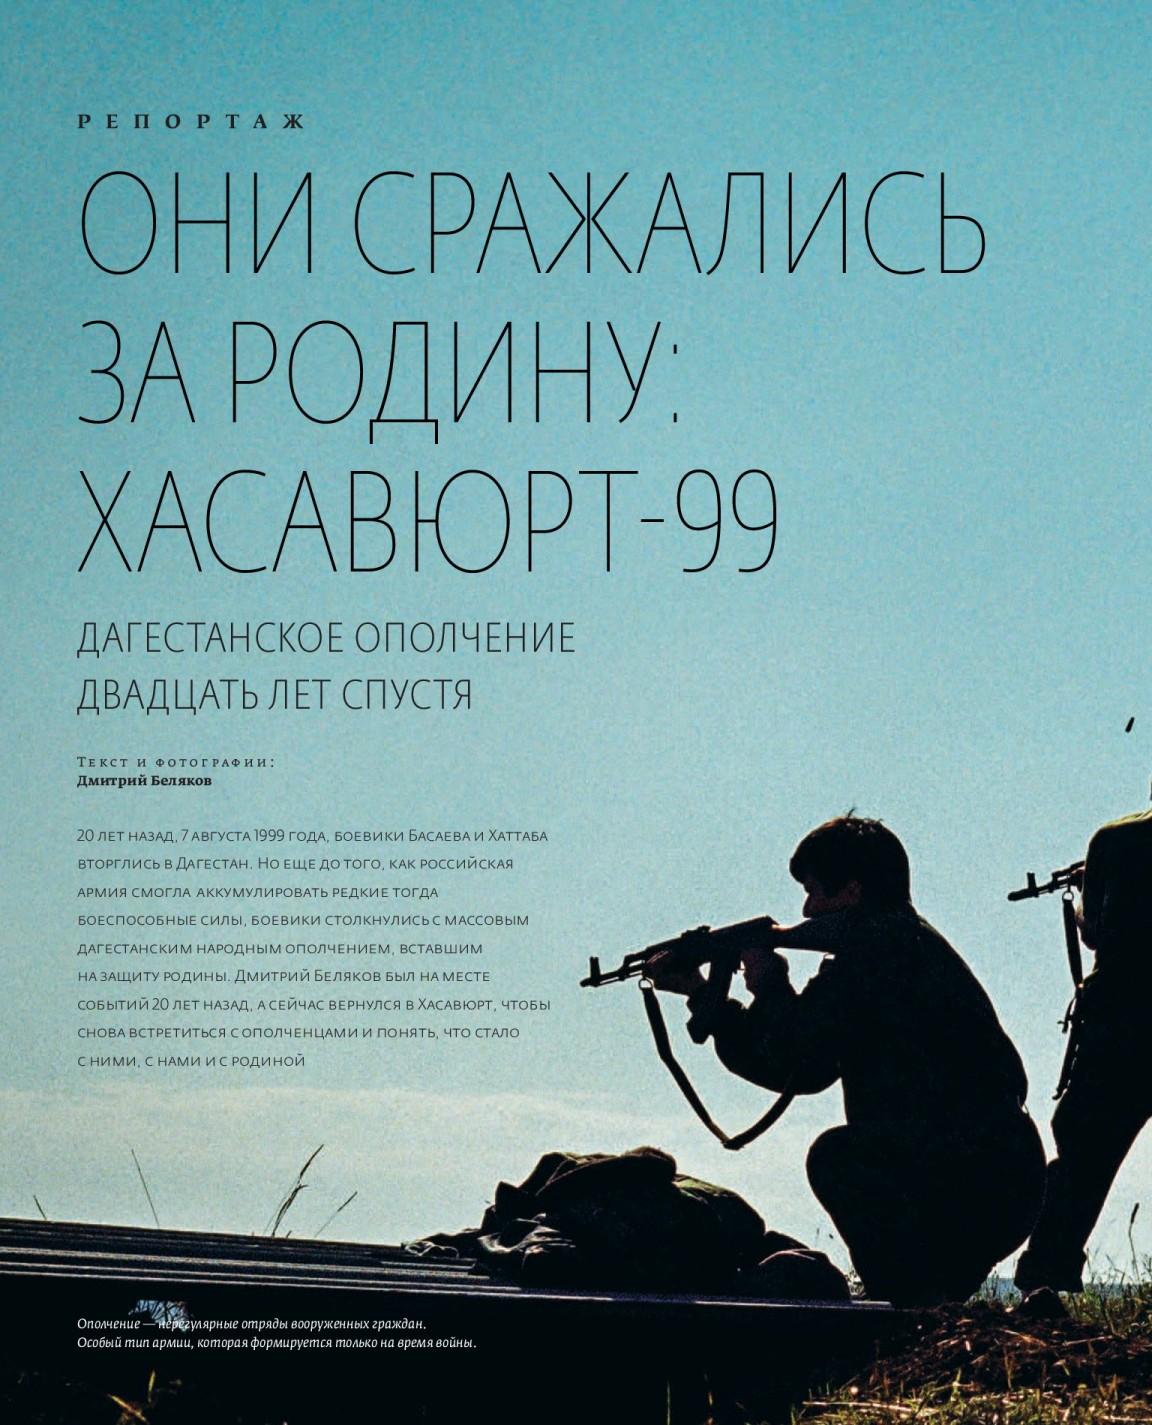 Госдума пообещала деньги защитникам Дагестана от банд Басаева ... | 1425x1152